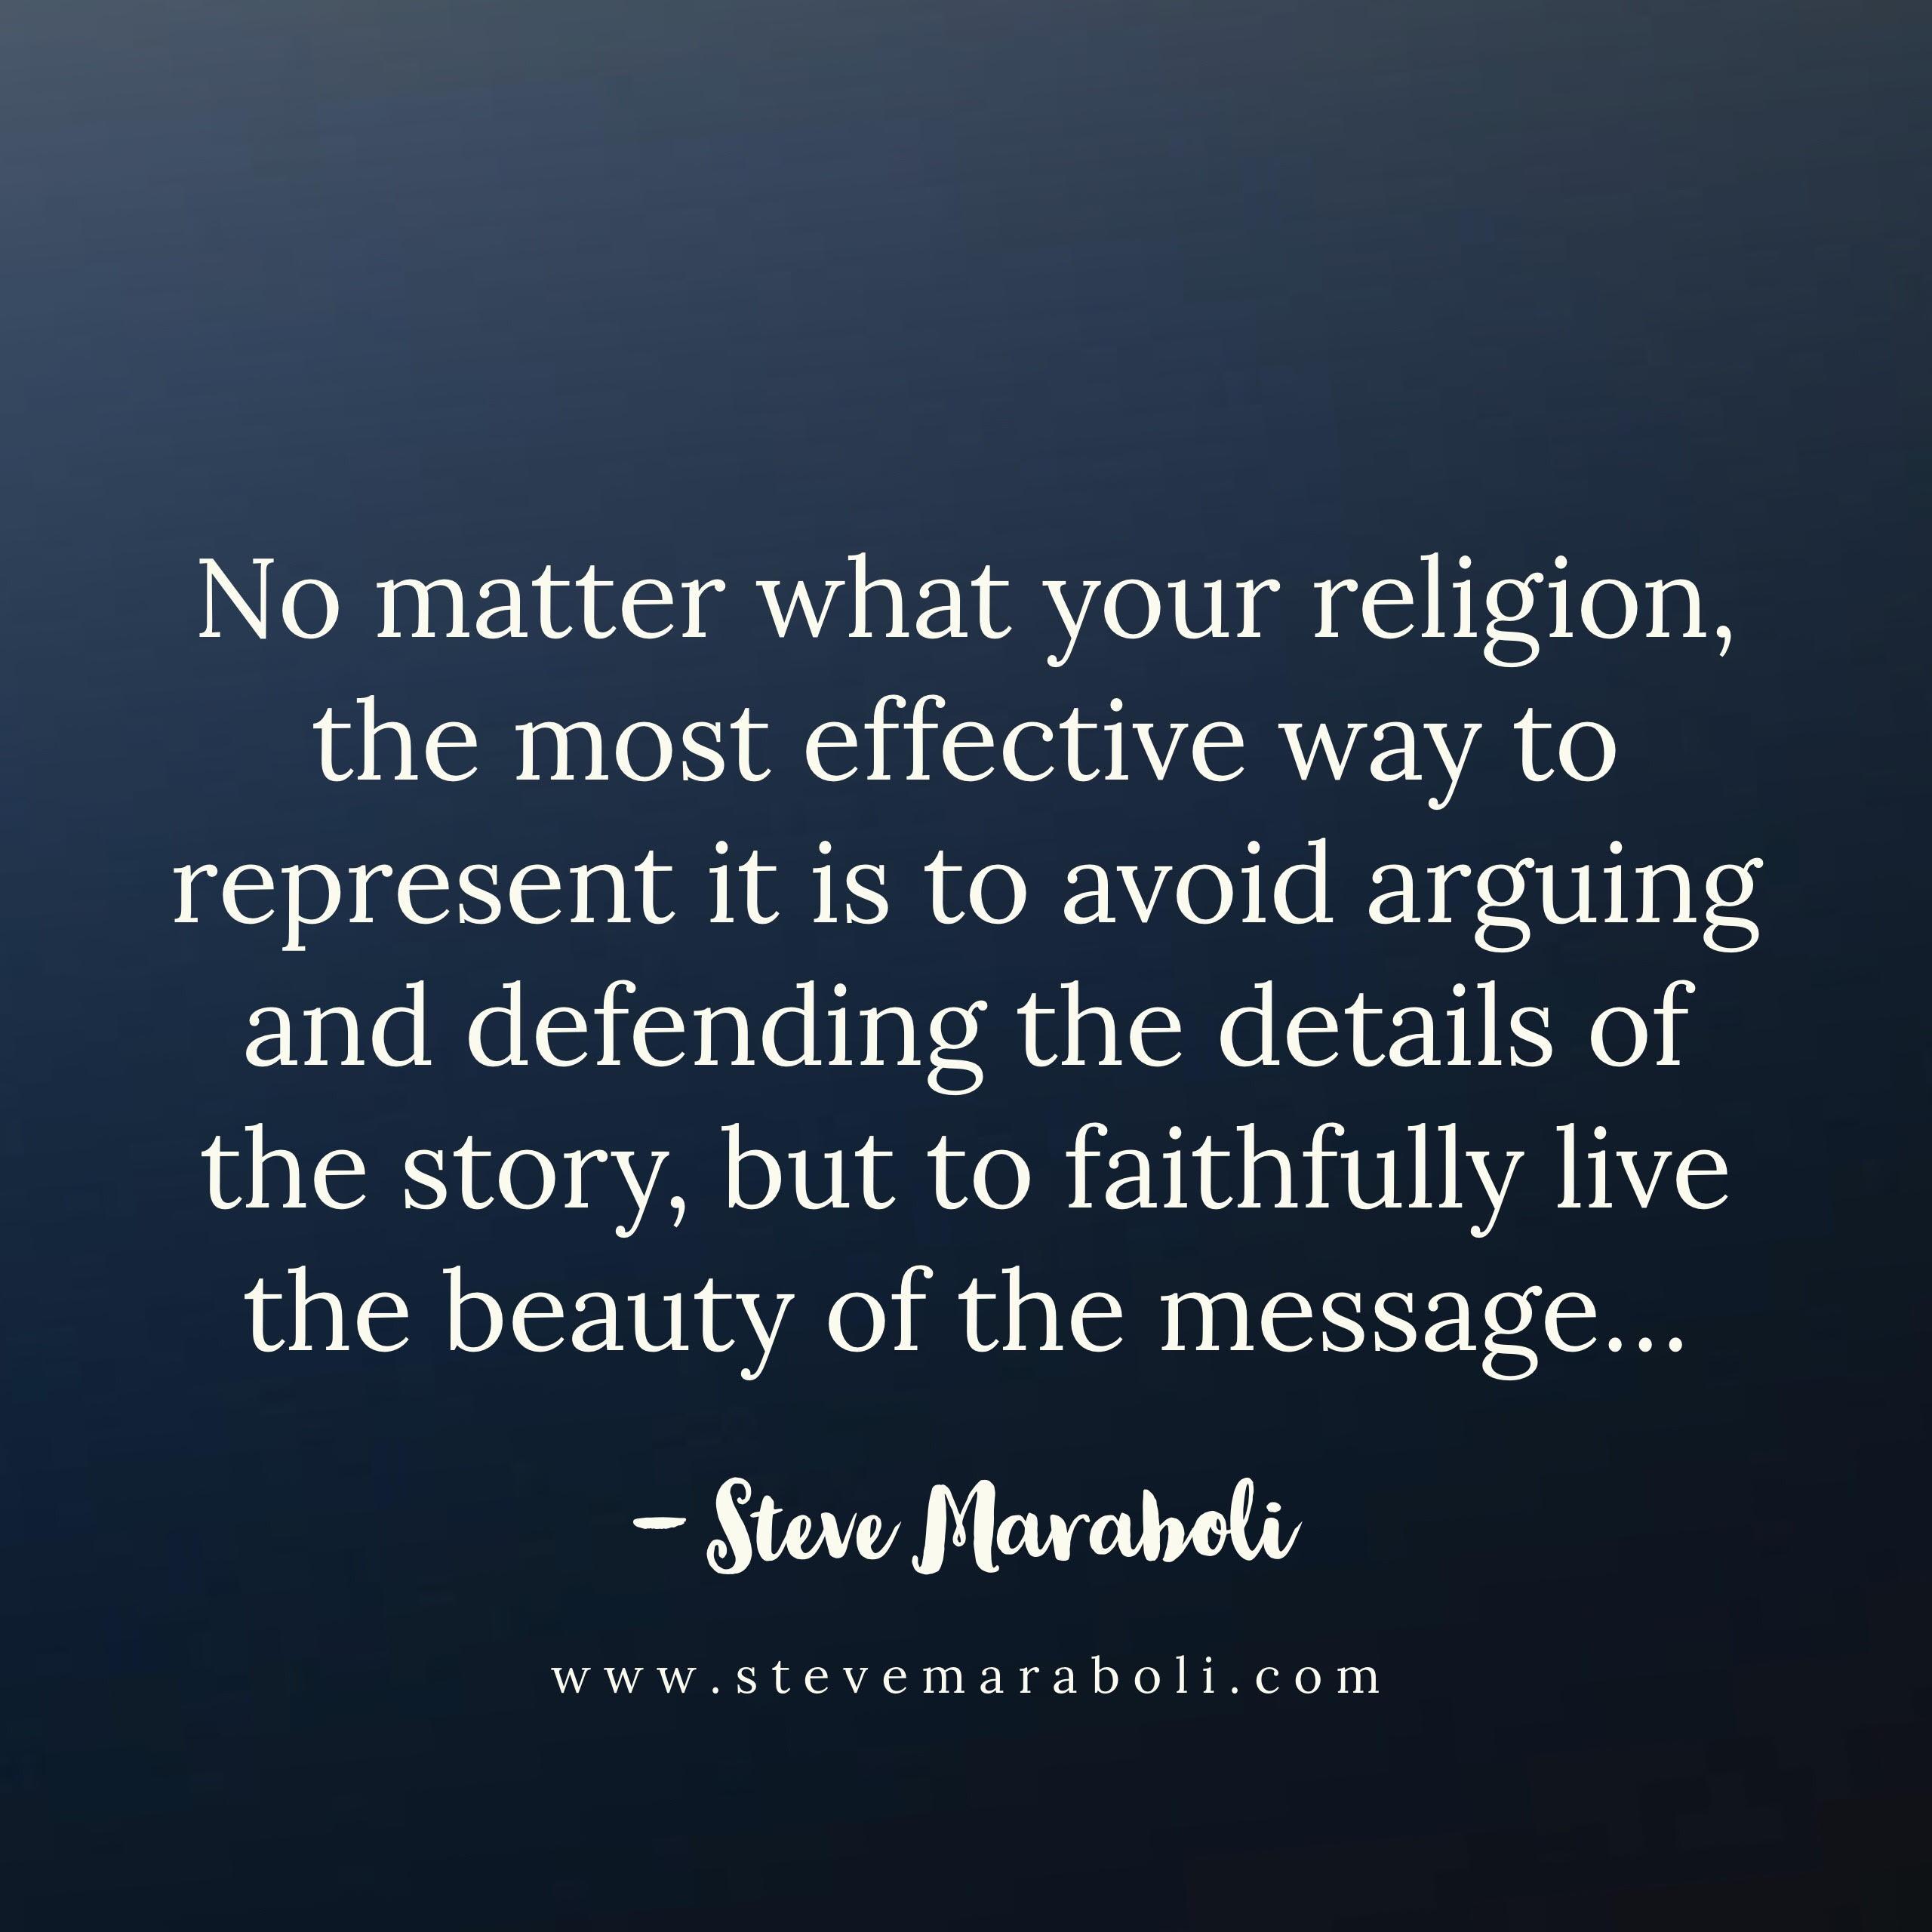 Reflections on God - Steve Maraboli